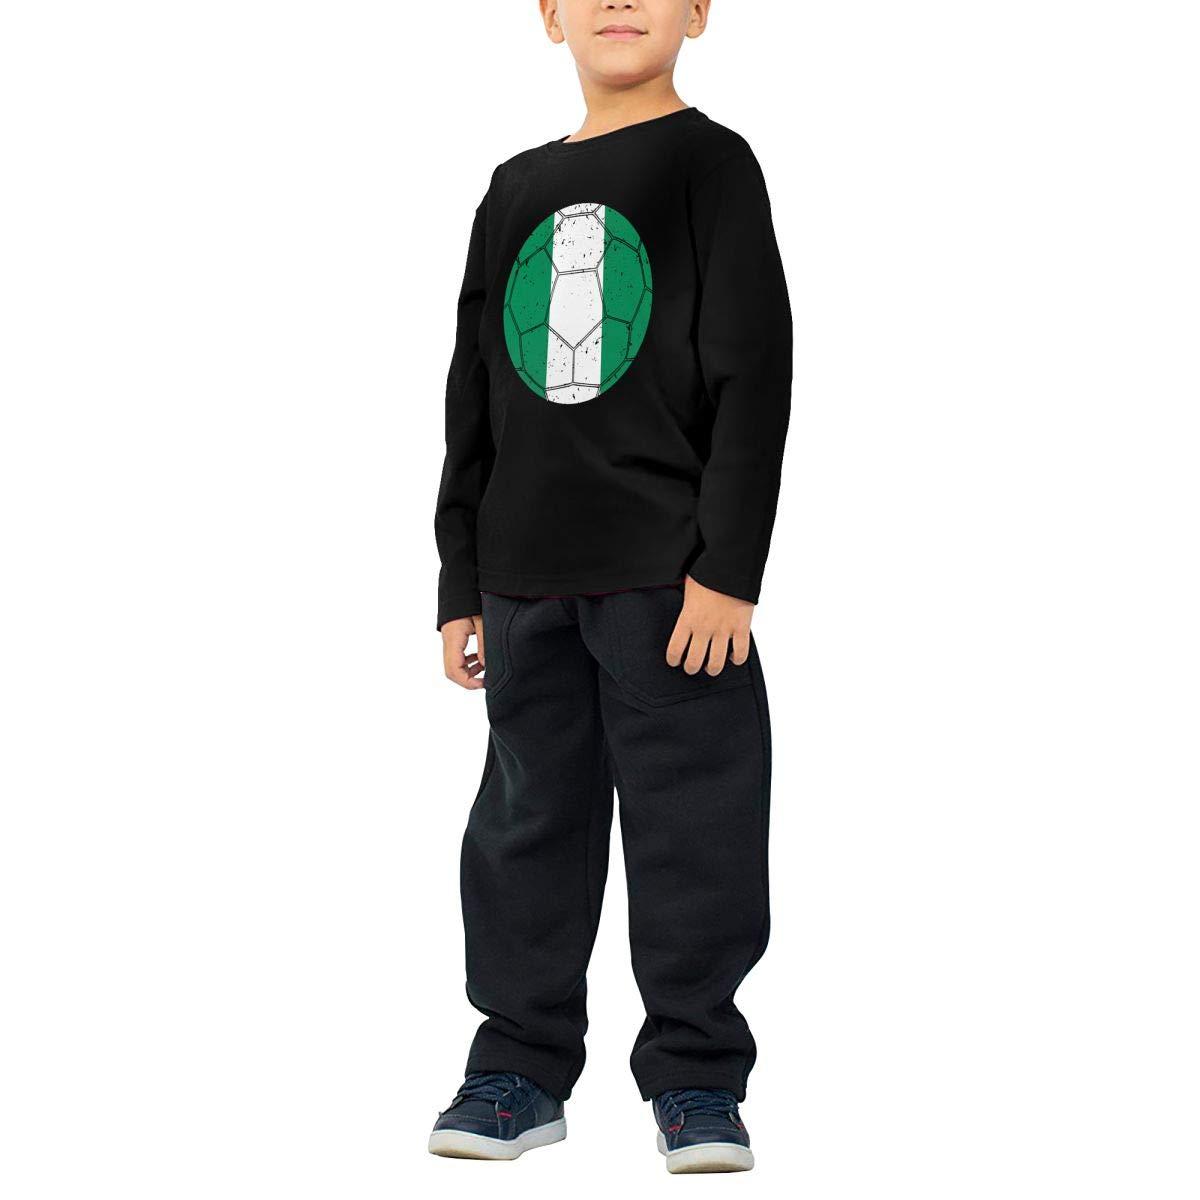 Nigerian Flag Soccer Football11 Kids Crewneck Long Sleeve Shirt Tee Jersey for Toddlers